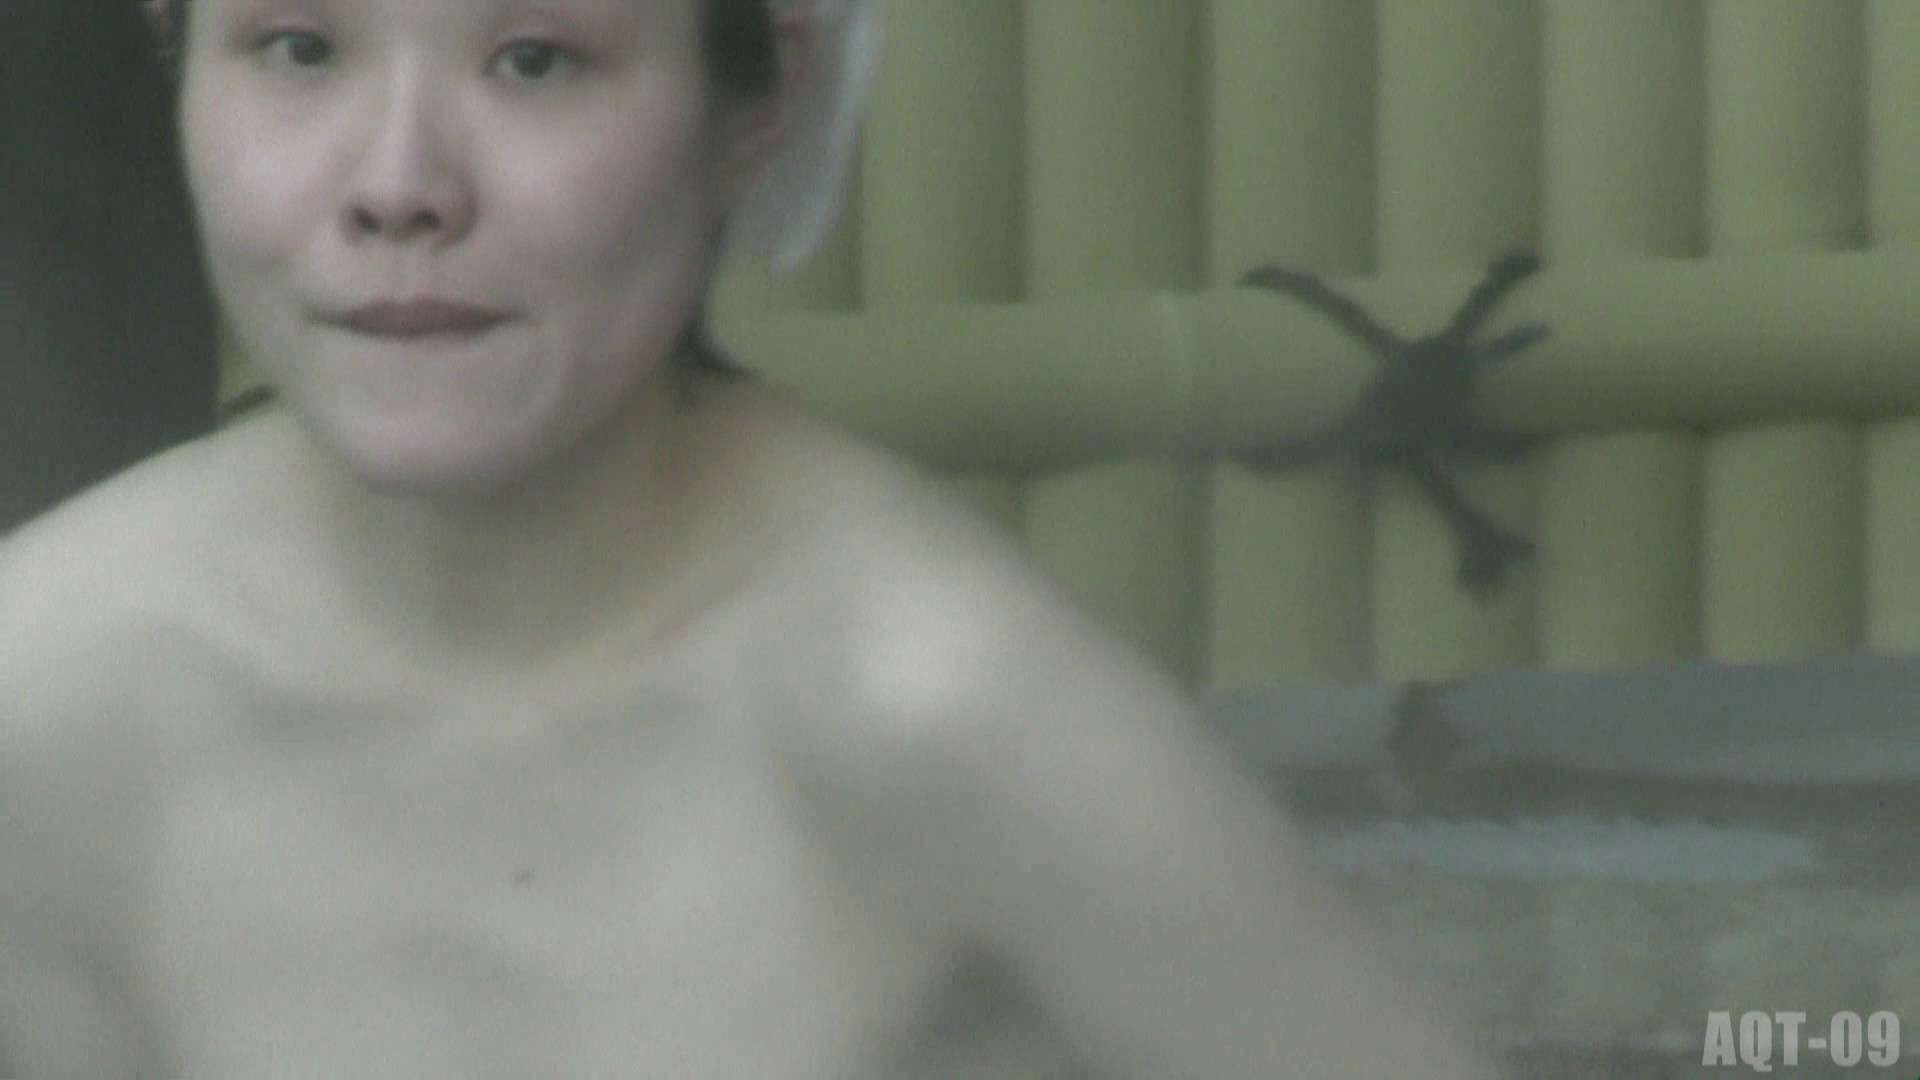 Aquaな露天風呂Vol.786 OLセックス  74画像 39